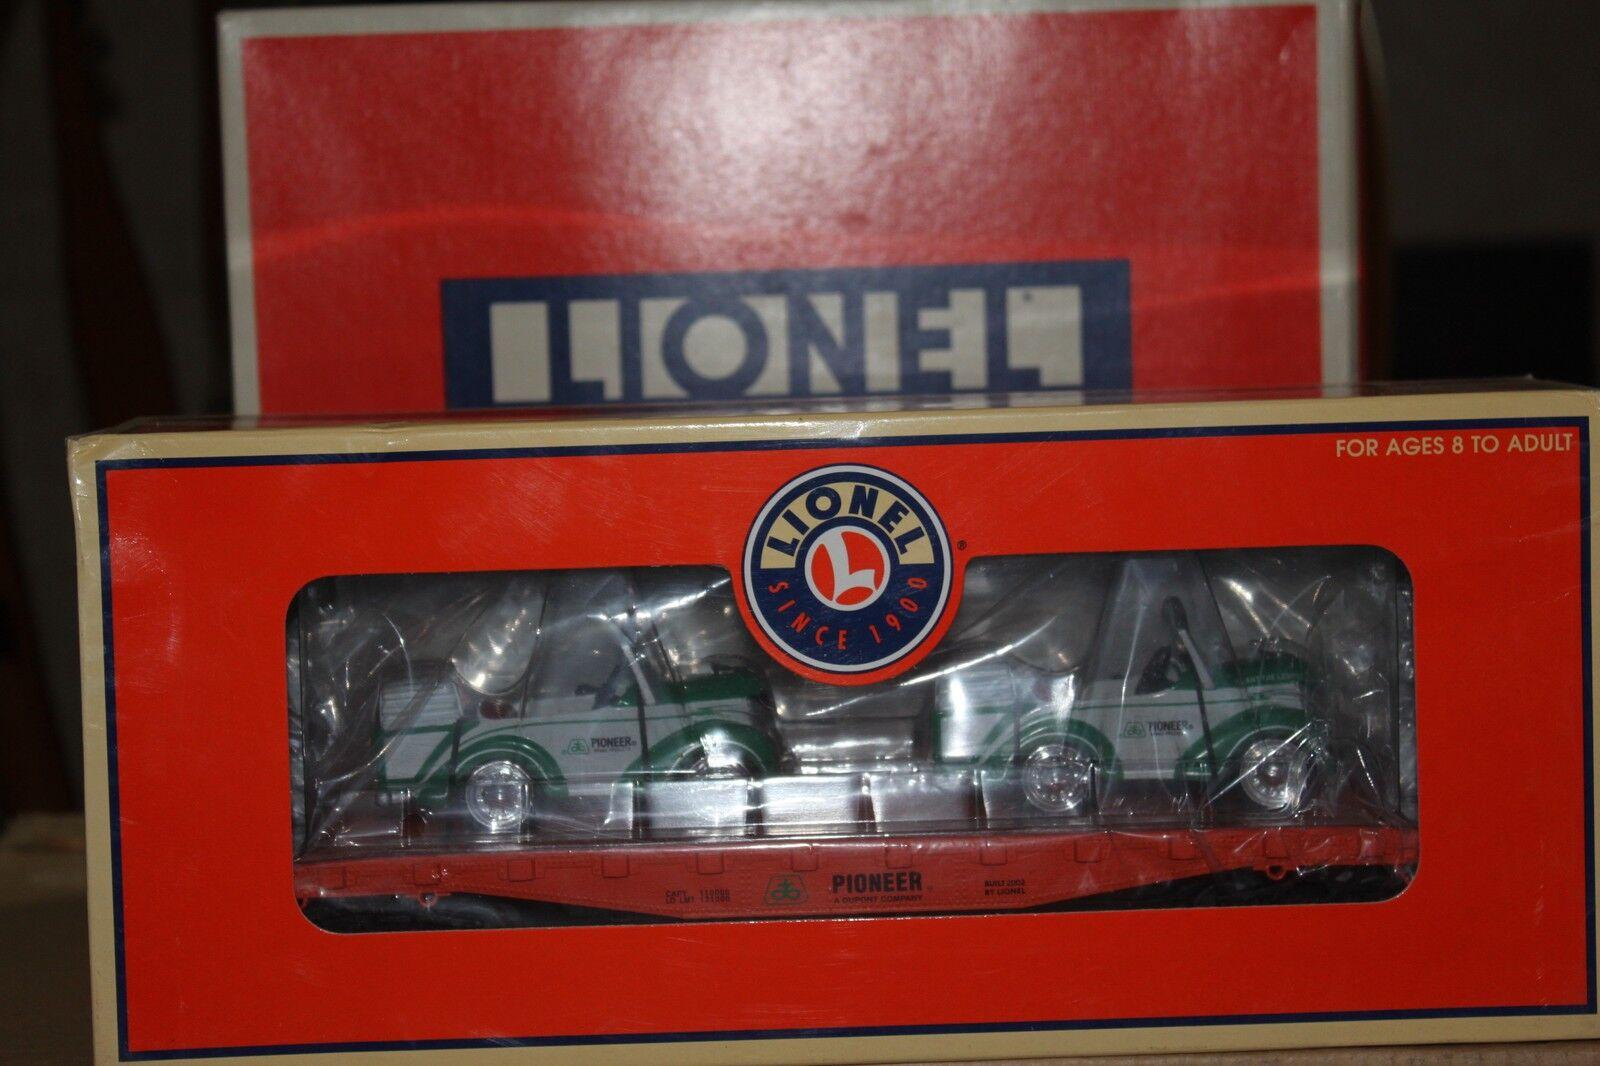 Lionel Pioneer Flatcar w/Classic Pedal Car 6-17572